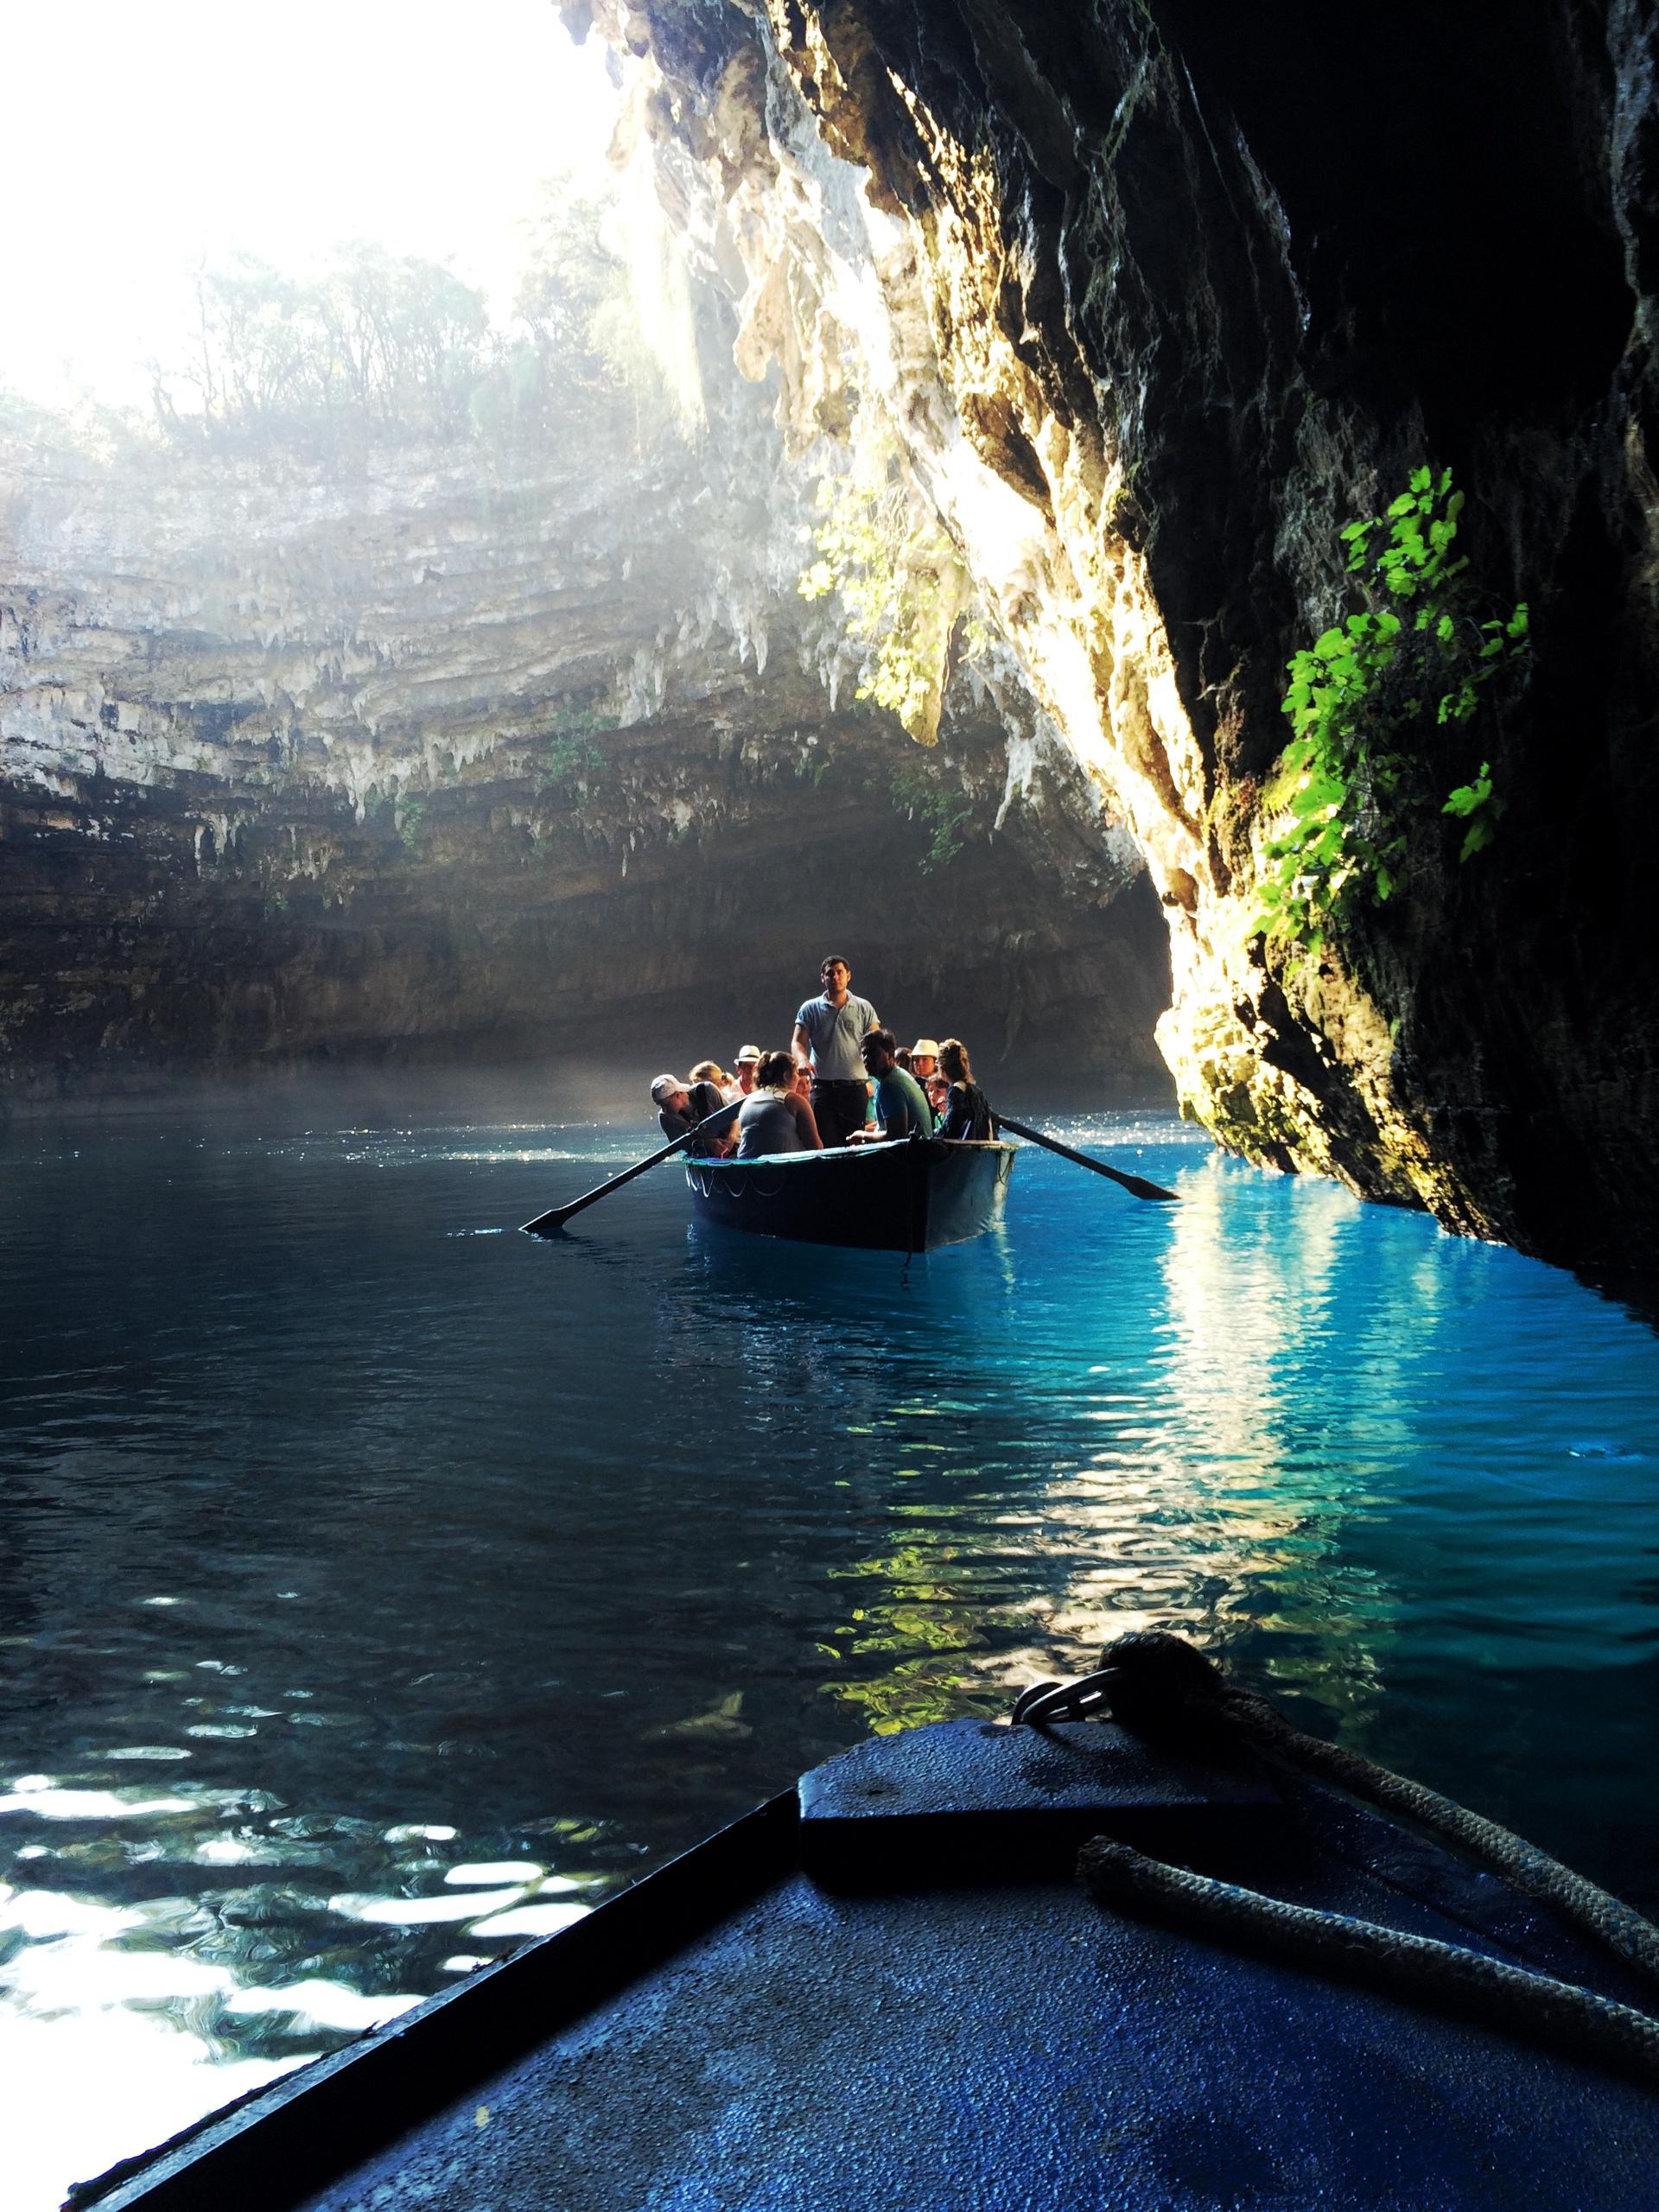 Magical Cave   watercraft, water, travel, transportation